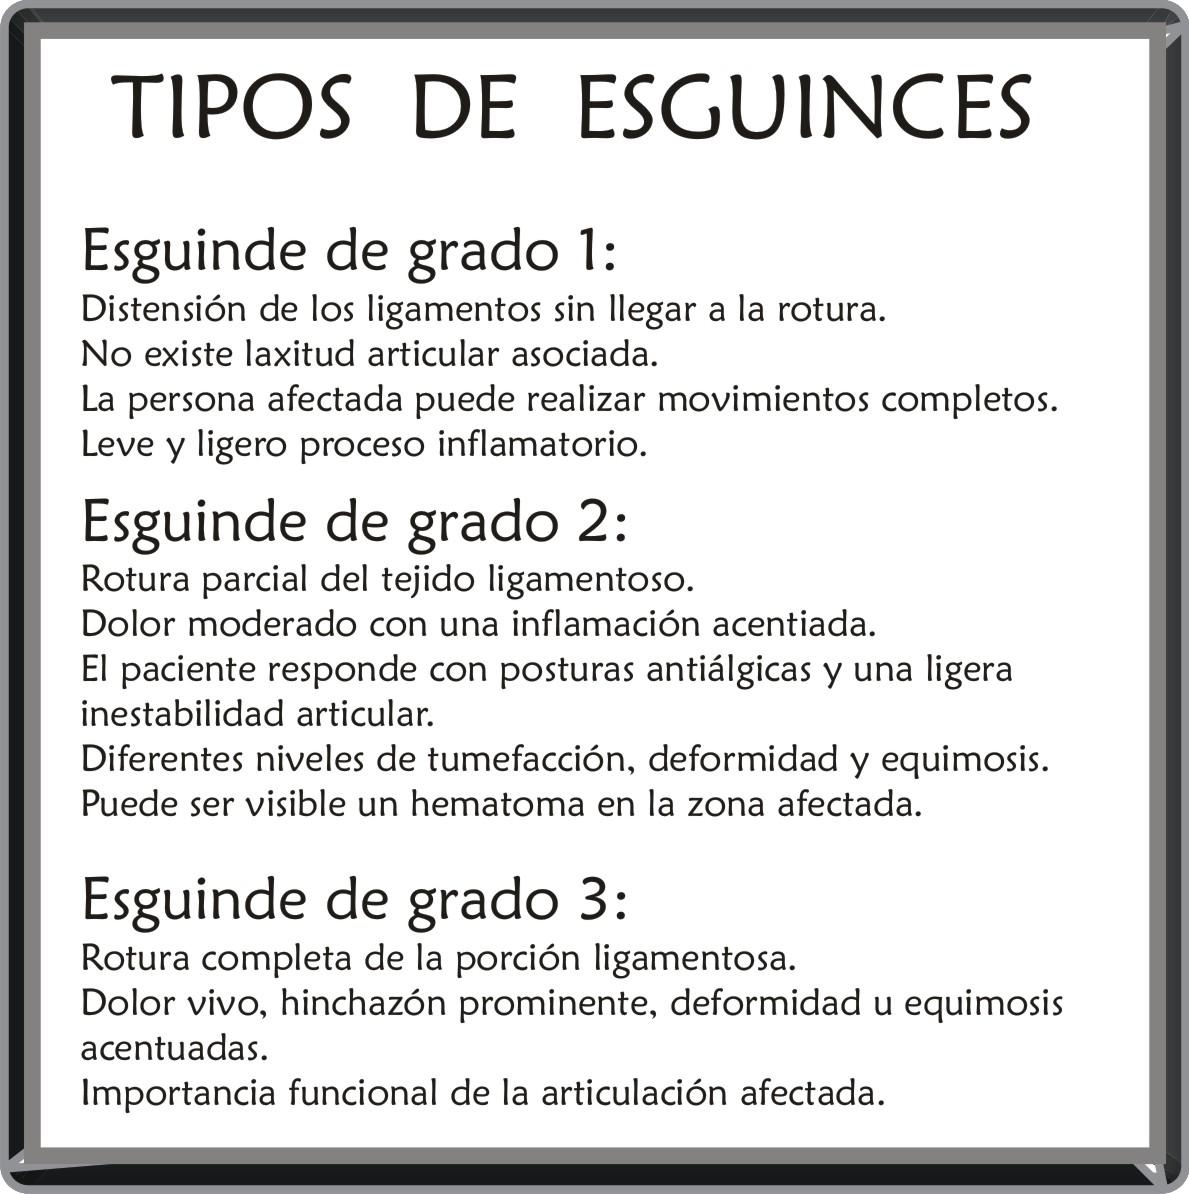 FISIOTERAPIA TRAUMATOLOGICA CORUA ESGUINCES WEBjpg